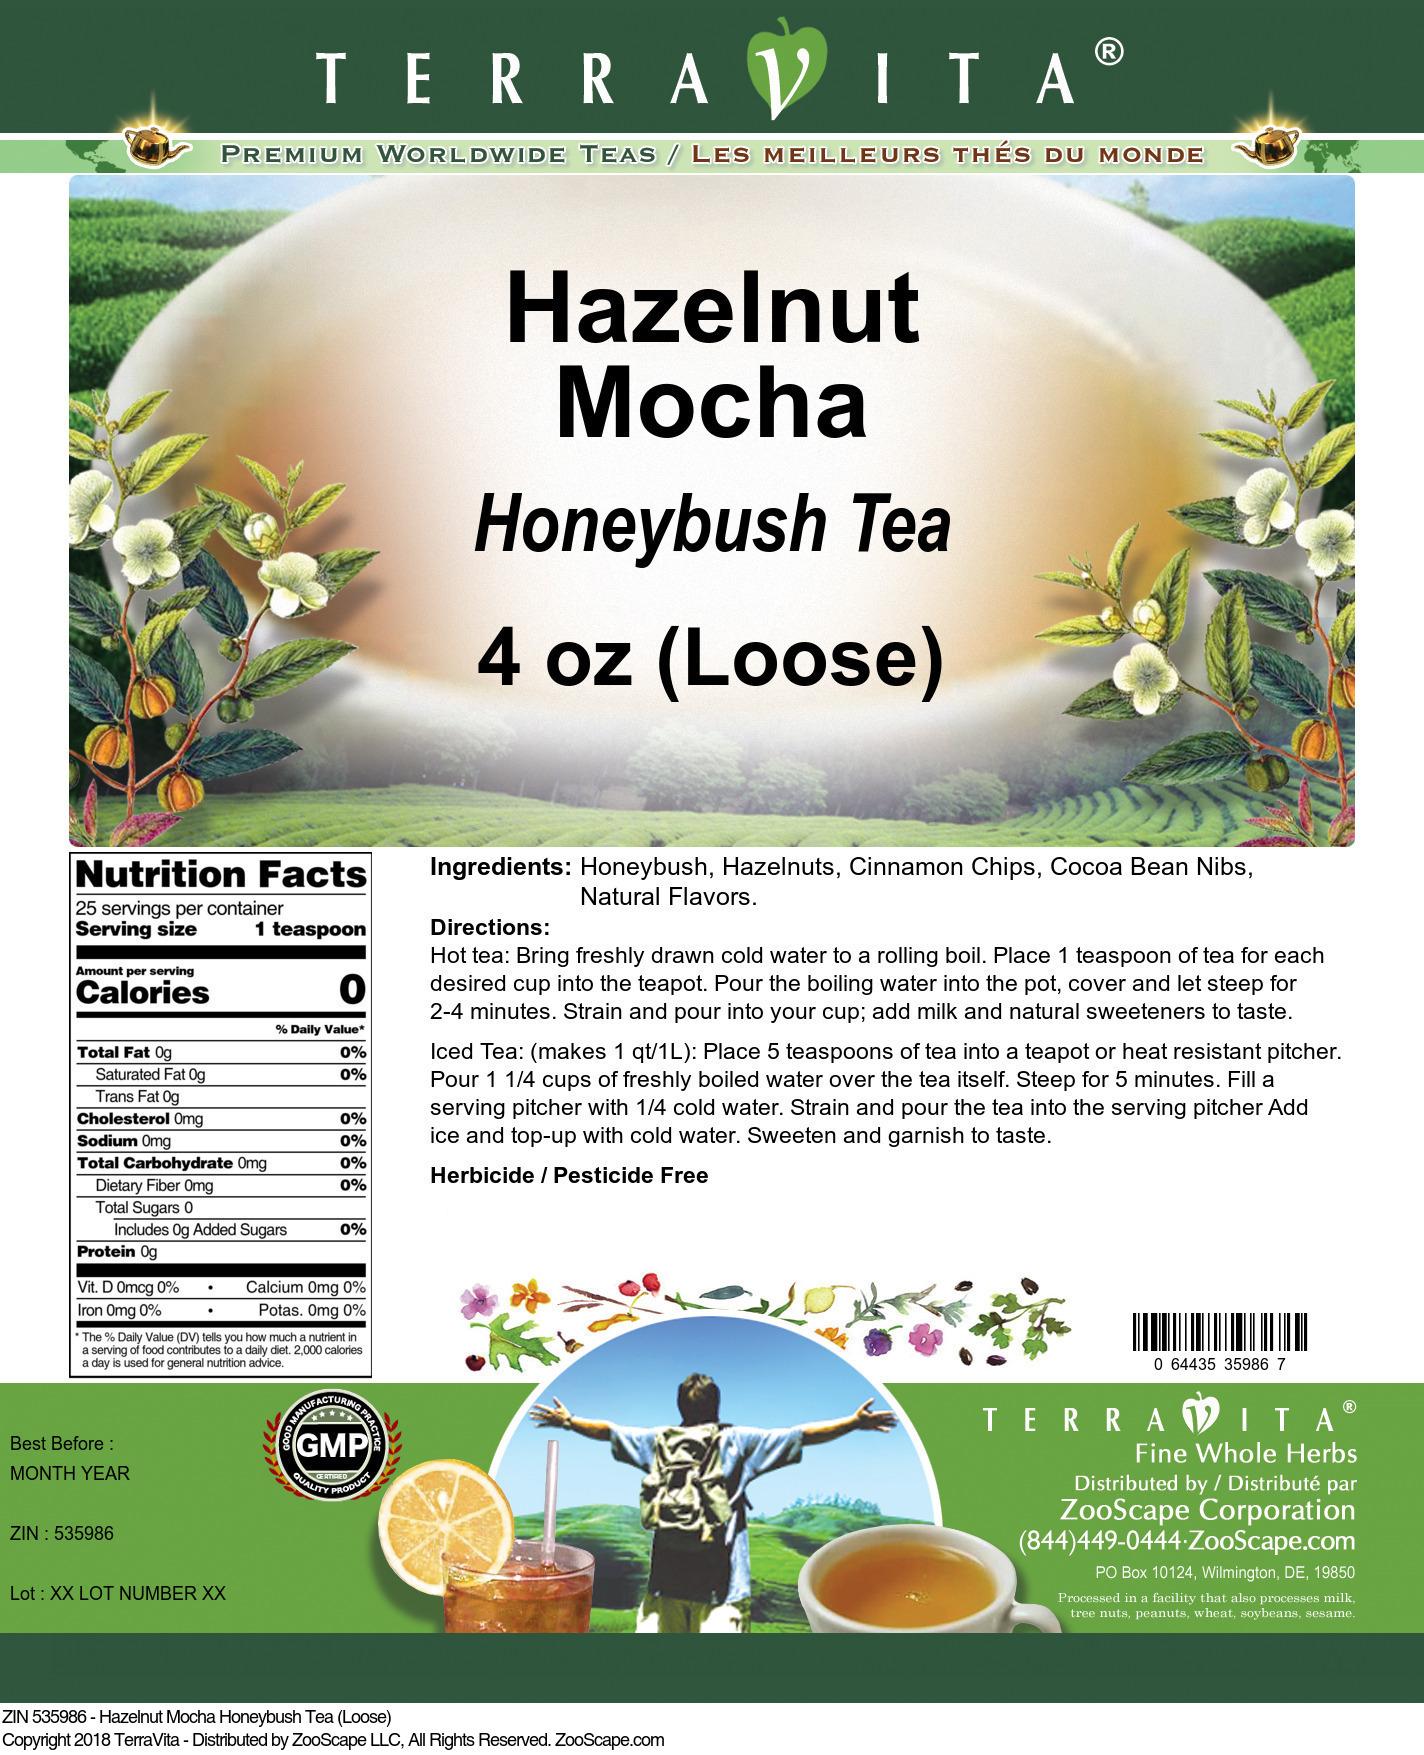 Hazelnut Mocha Honeybush Tea (Loose)